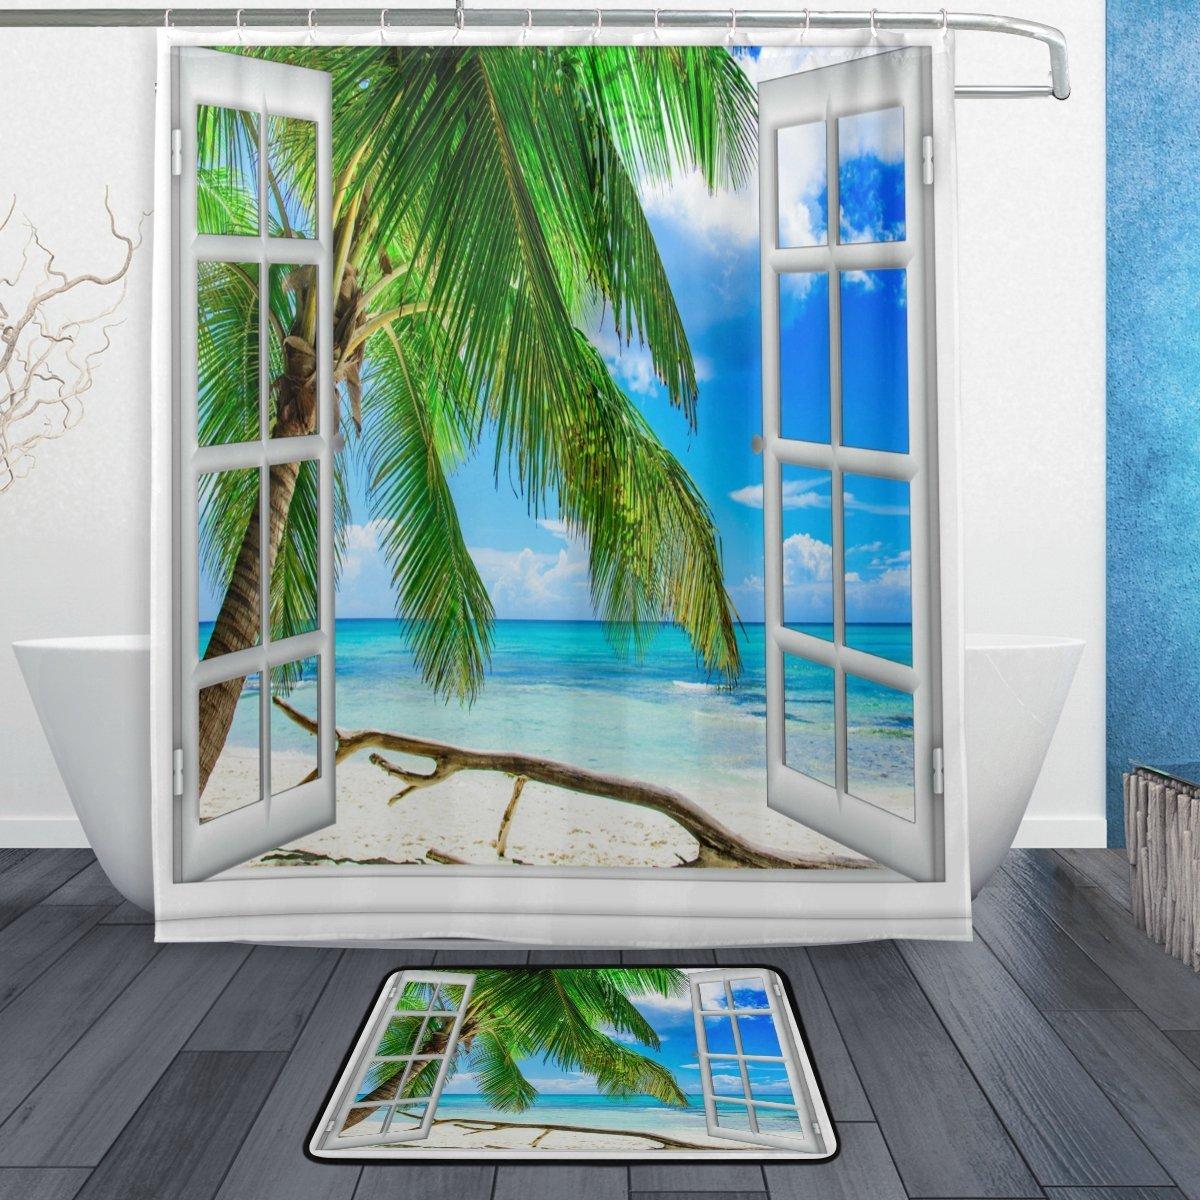 Beach Ocean Theme Shower Curtain and Mat Set, Tropical Palm Tree White Window Waterproof Fabric Bathroom Curtain